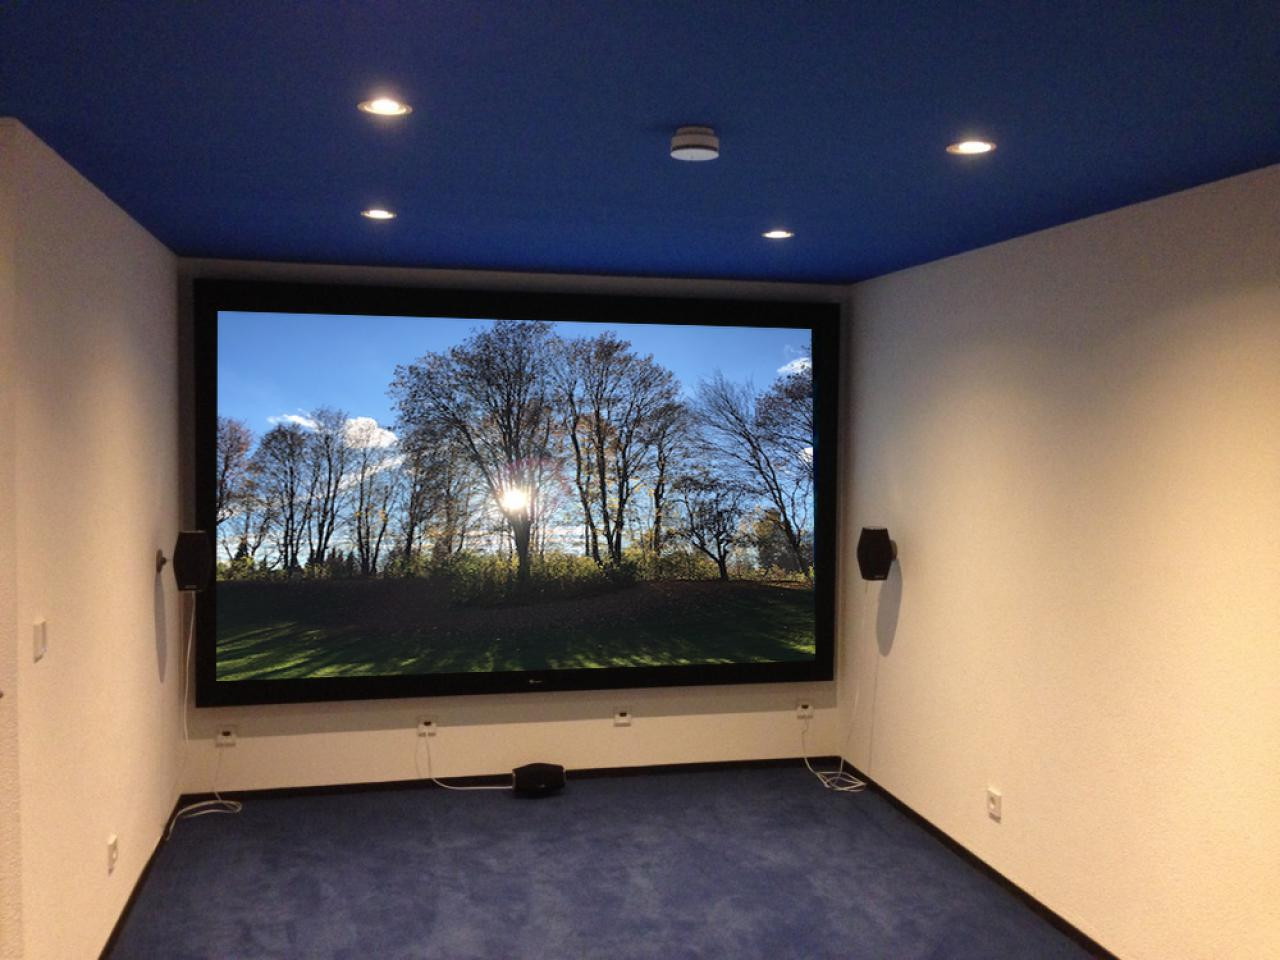 Heimkino_DeepBlue-Rahmenleinwand-Kino-im